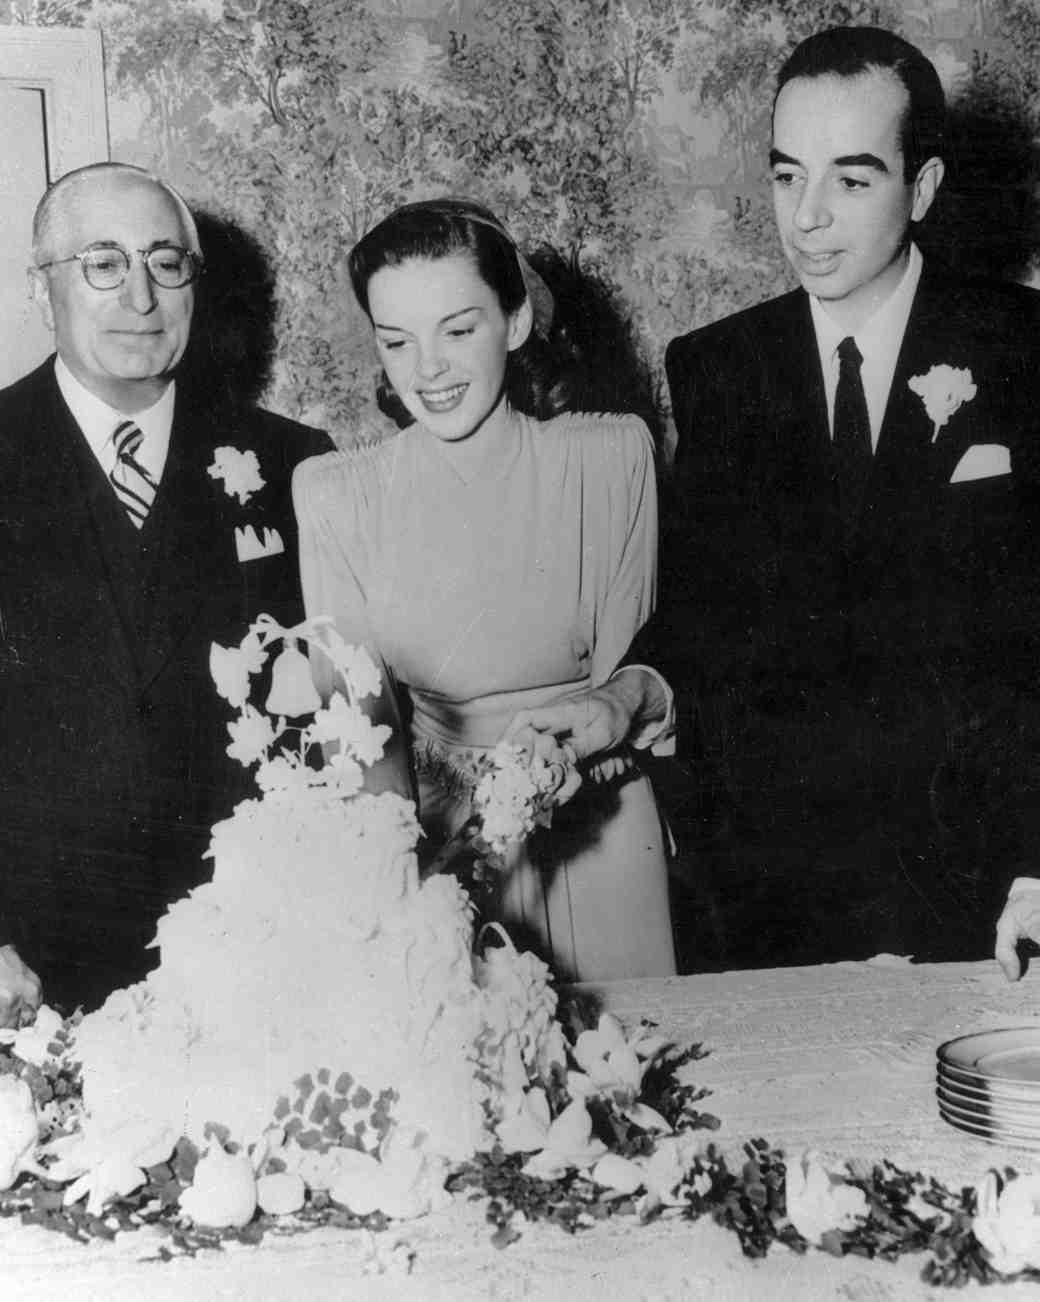 celebrity-vintage-wedding-cakes-judy-garland-3368101-1015.jpg